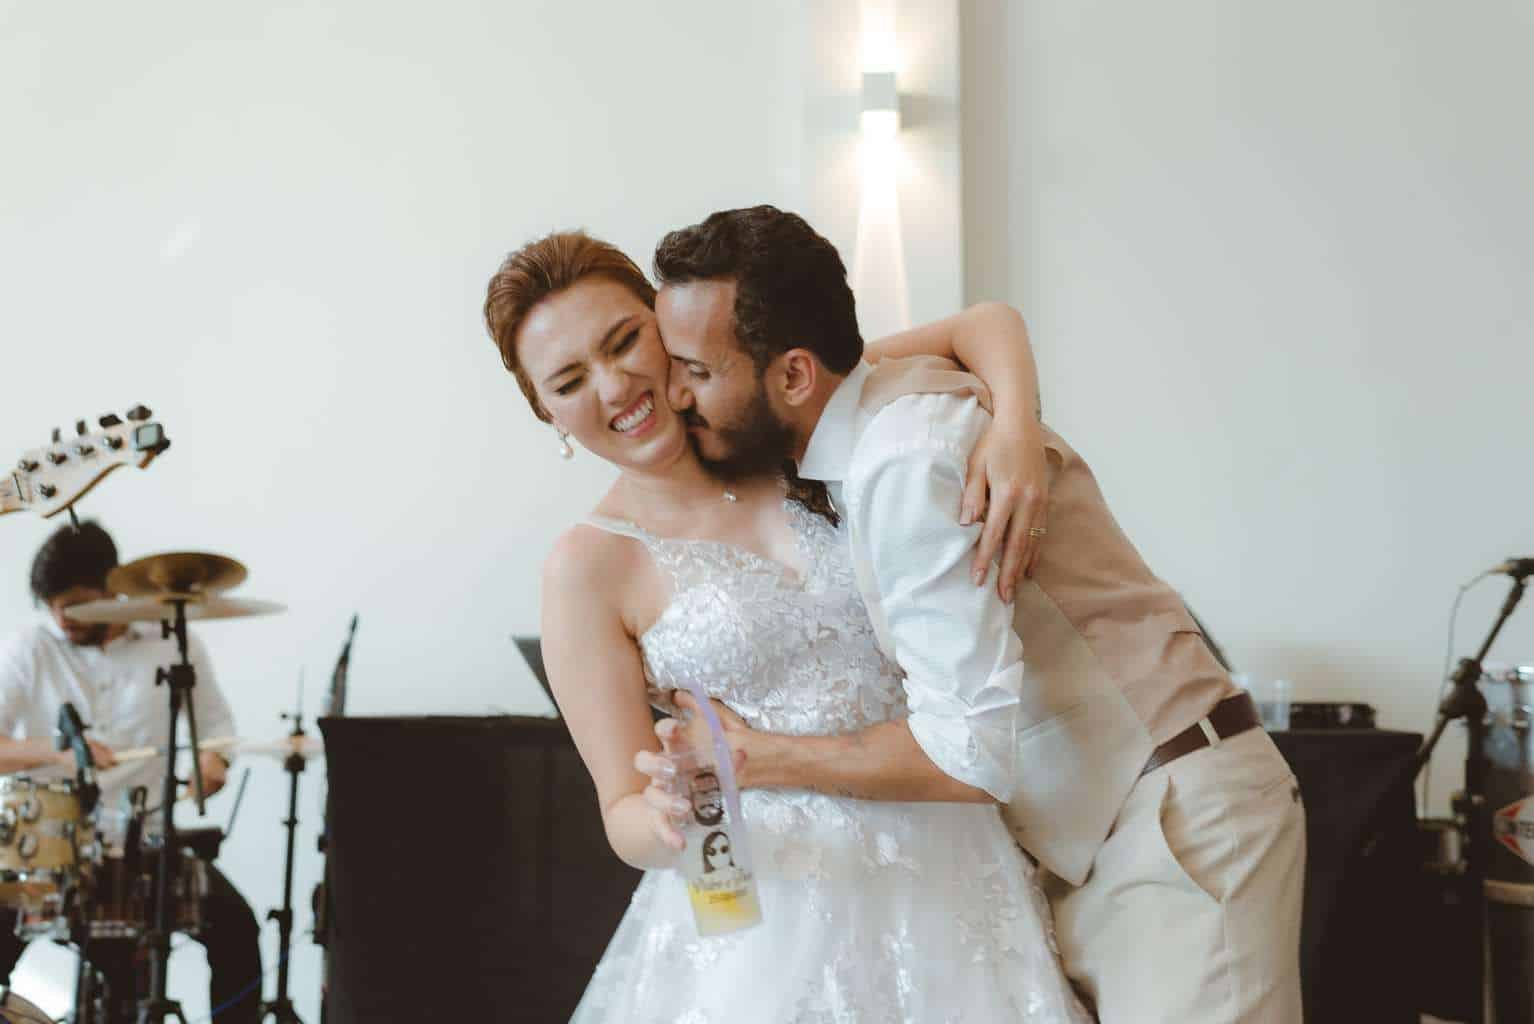 casamento-ao-ar-livre-casamento-boho-casamento-geek-casamento-rustico-casamento-Thais-e-Pedro-festa-Revoar-Fotografia-Villa-Borghese-Eventos-84